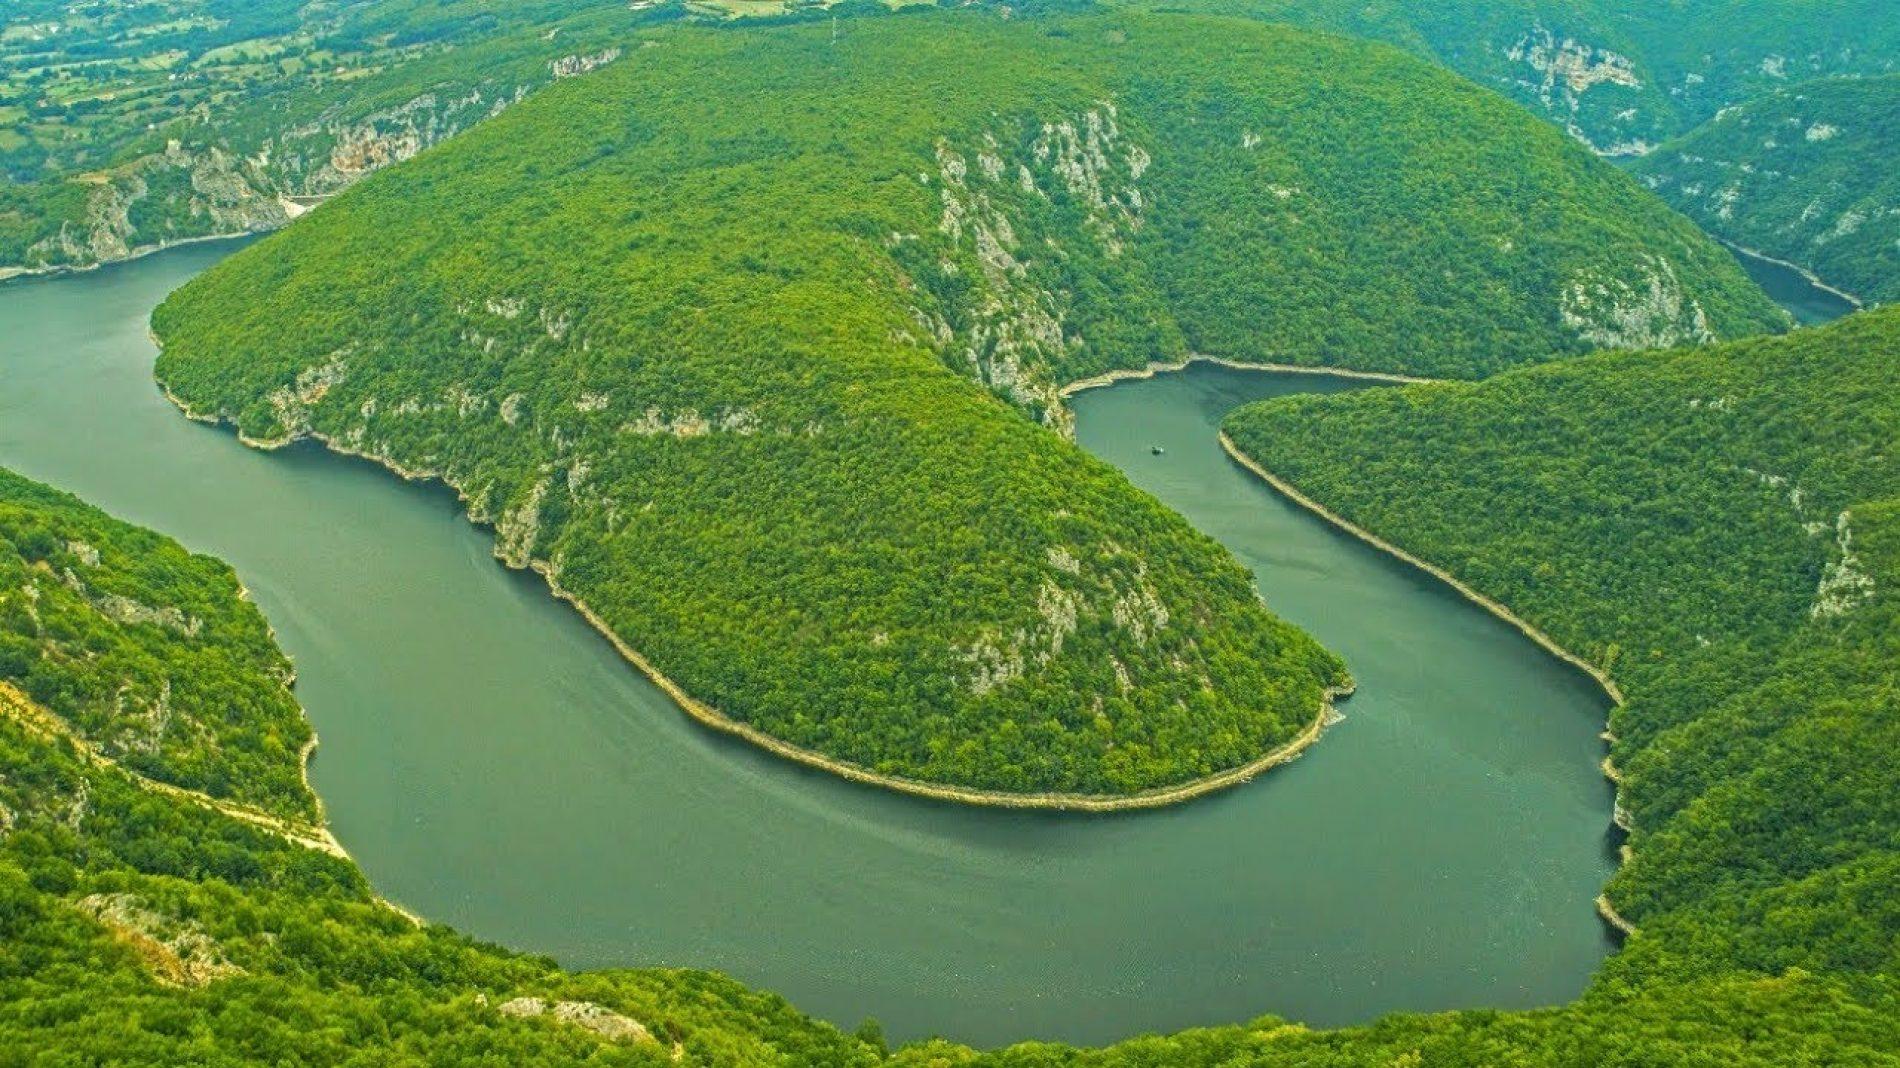 Ljepote Bosne: Kanjon rijeke Vrbas (VIDEO)